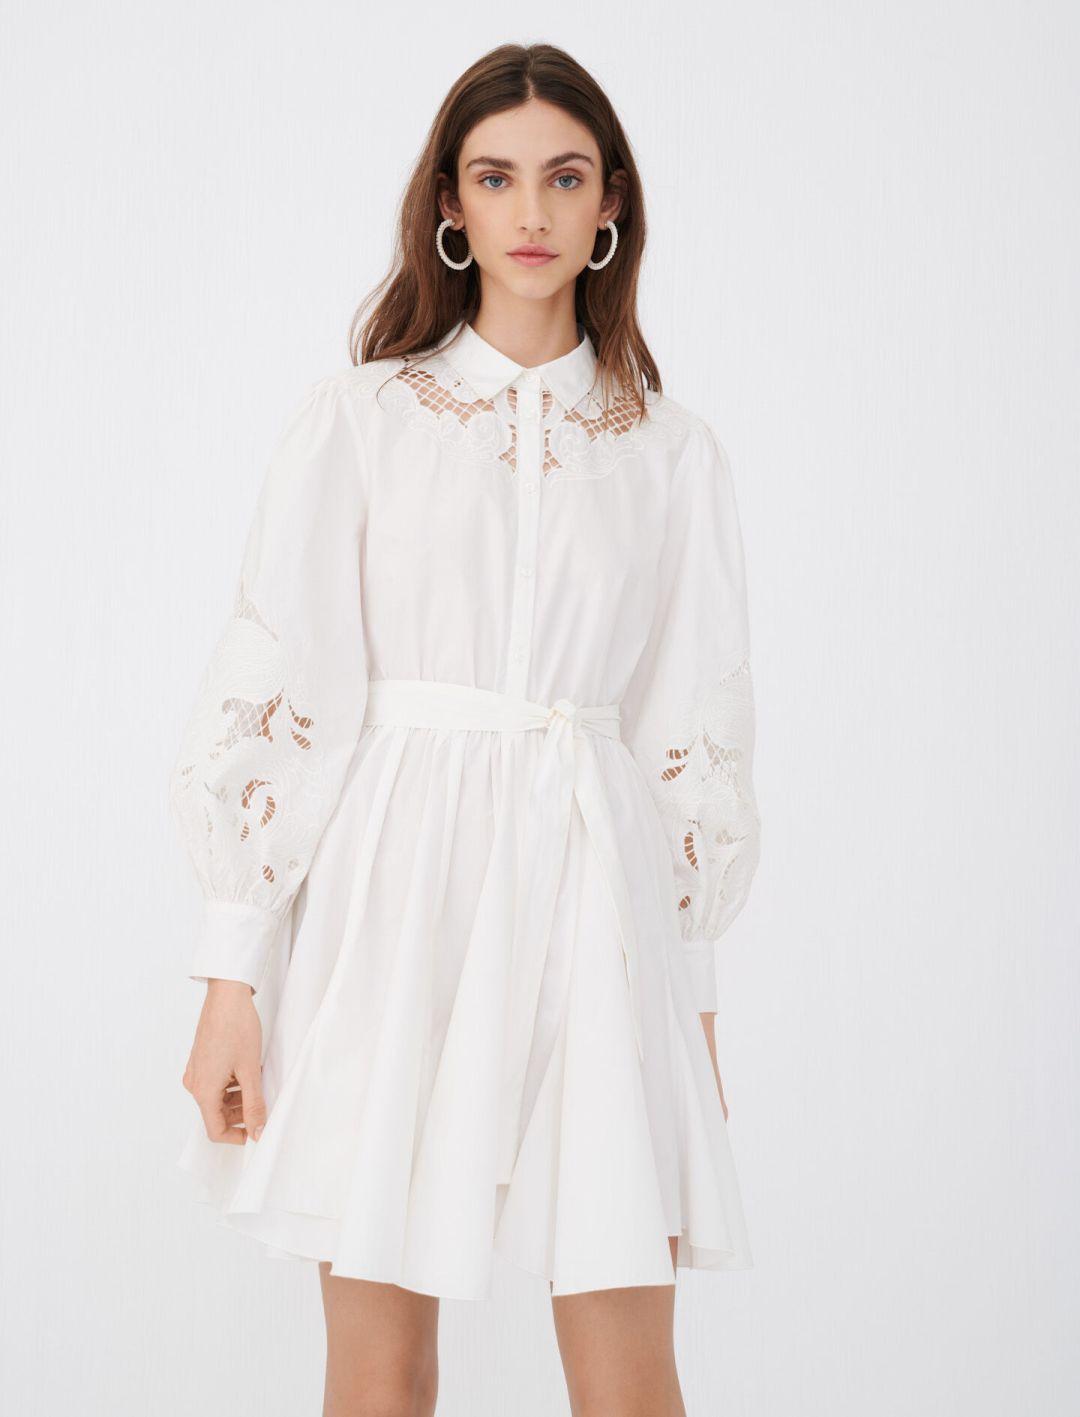 Maje Clothing Review, MAJE WHITE DRESS